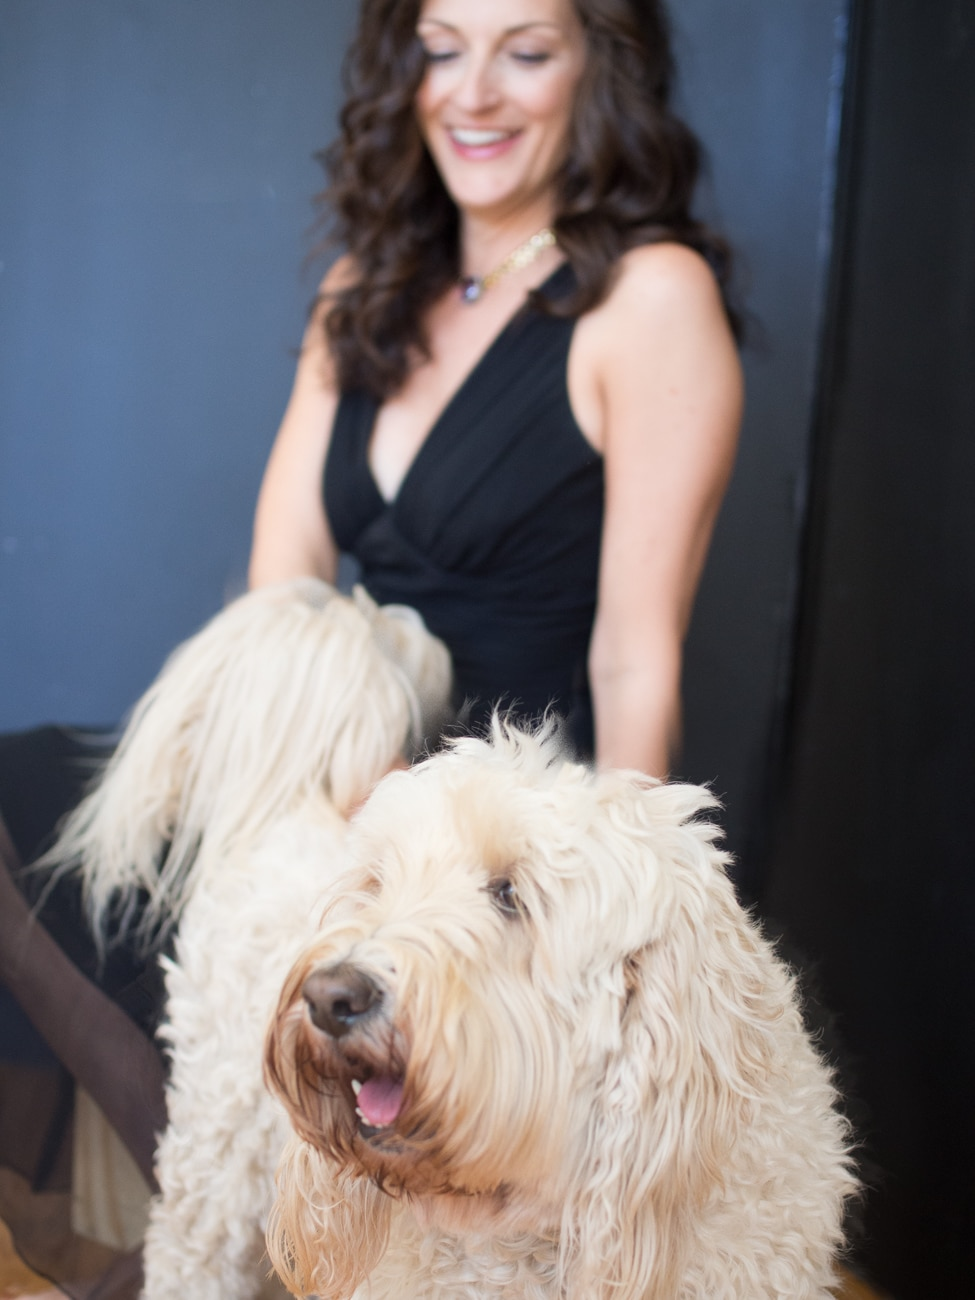 Photo by Margo Millure (www.margomillure.com)